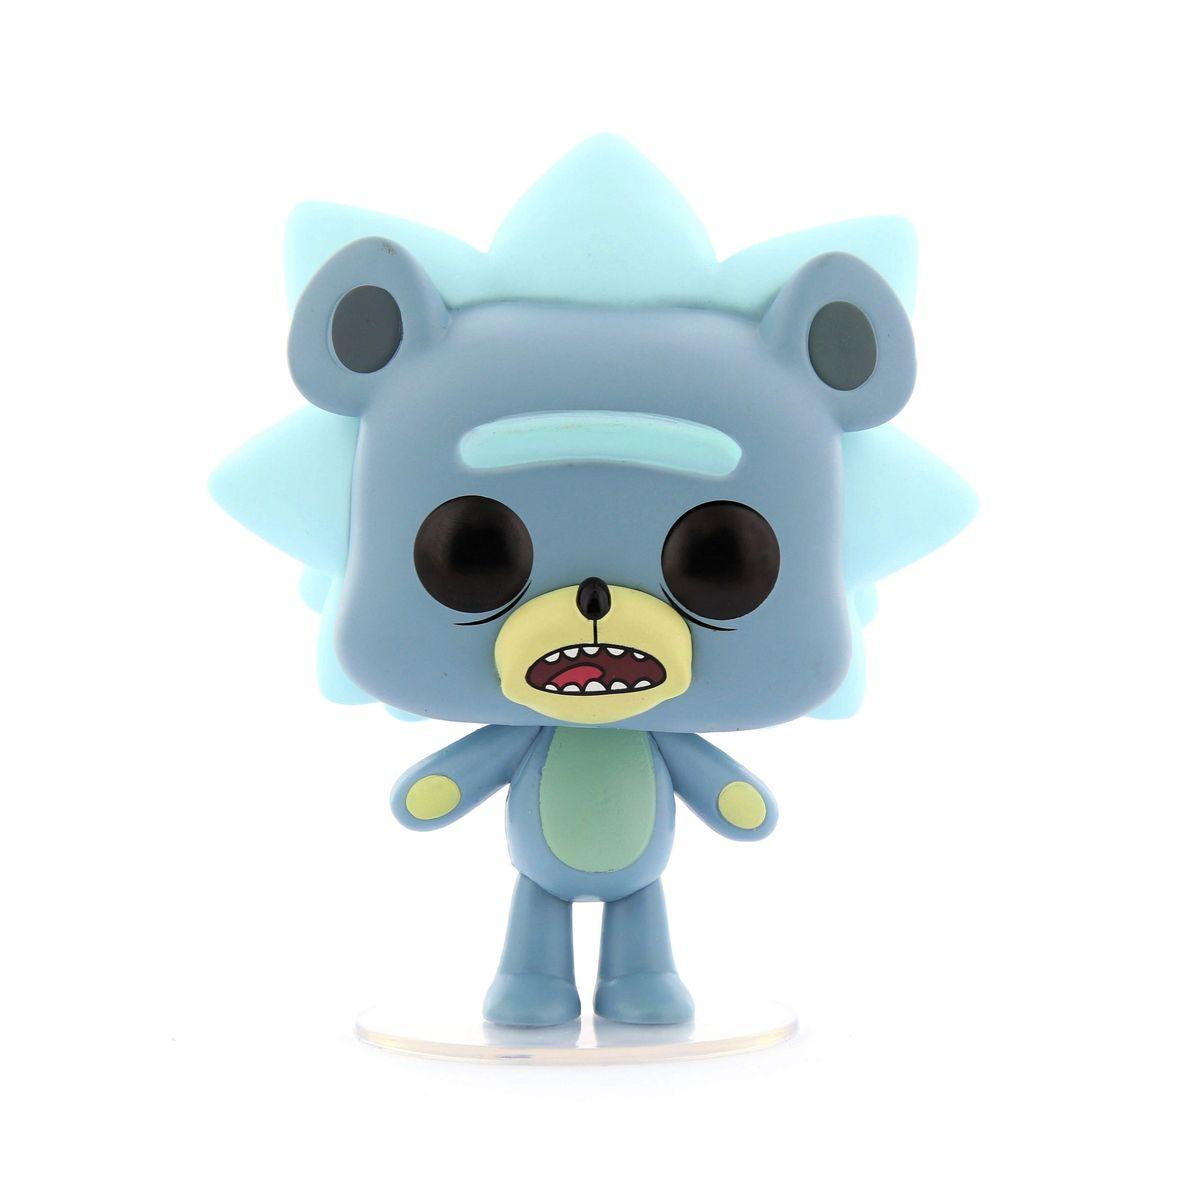 Funko Pop Animation Rick & Morty Teddy Rick Vinyl Figure